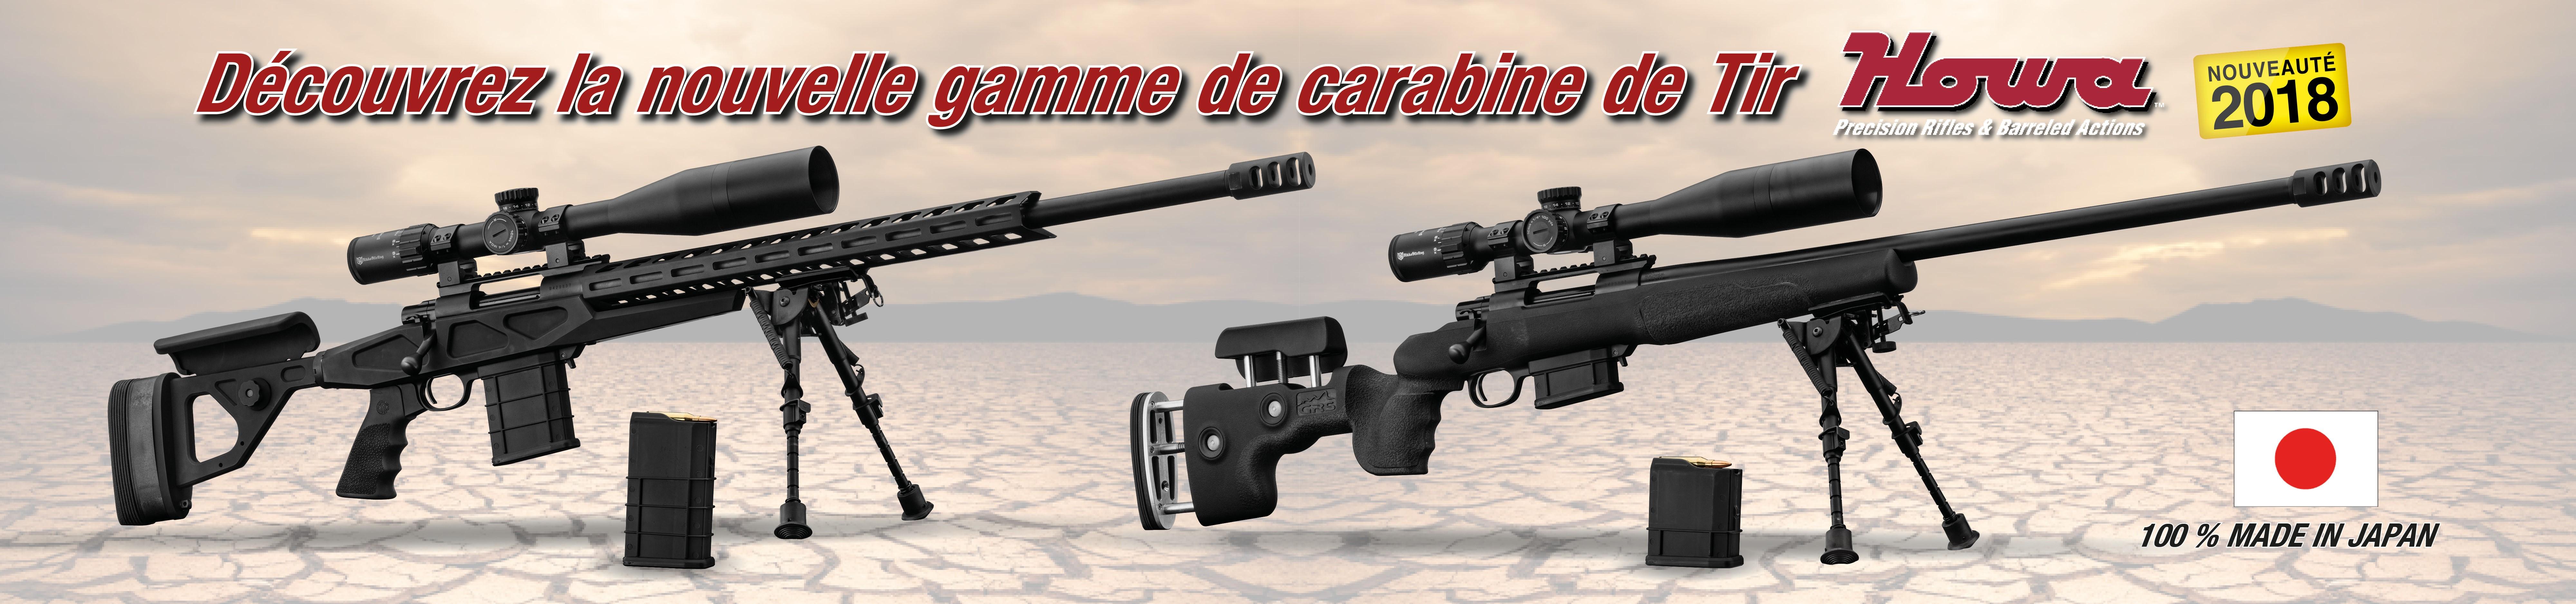 Carabine de tir a longue distance HOWA cal.308 Win